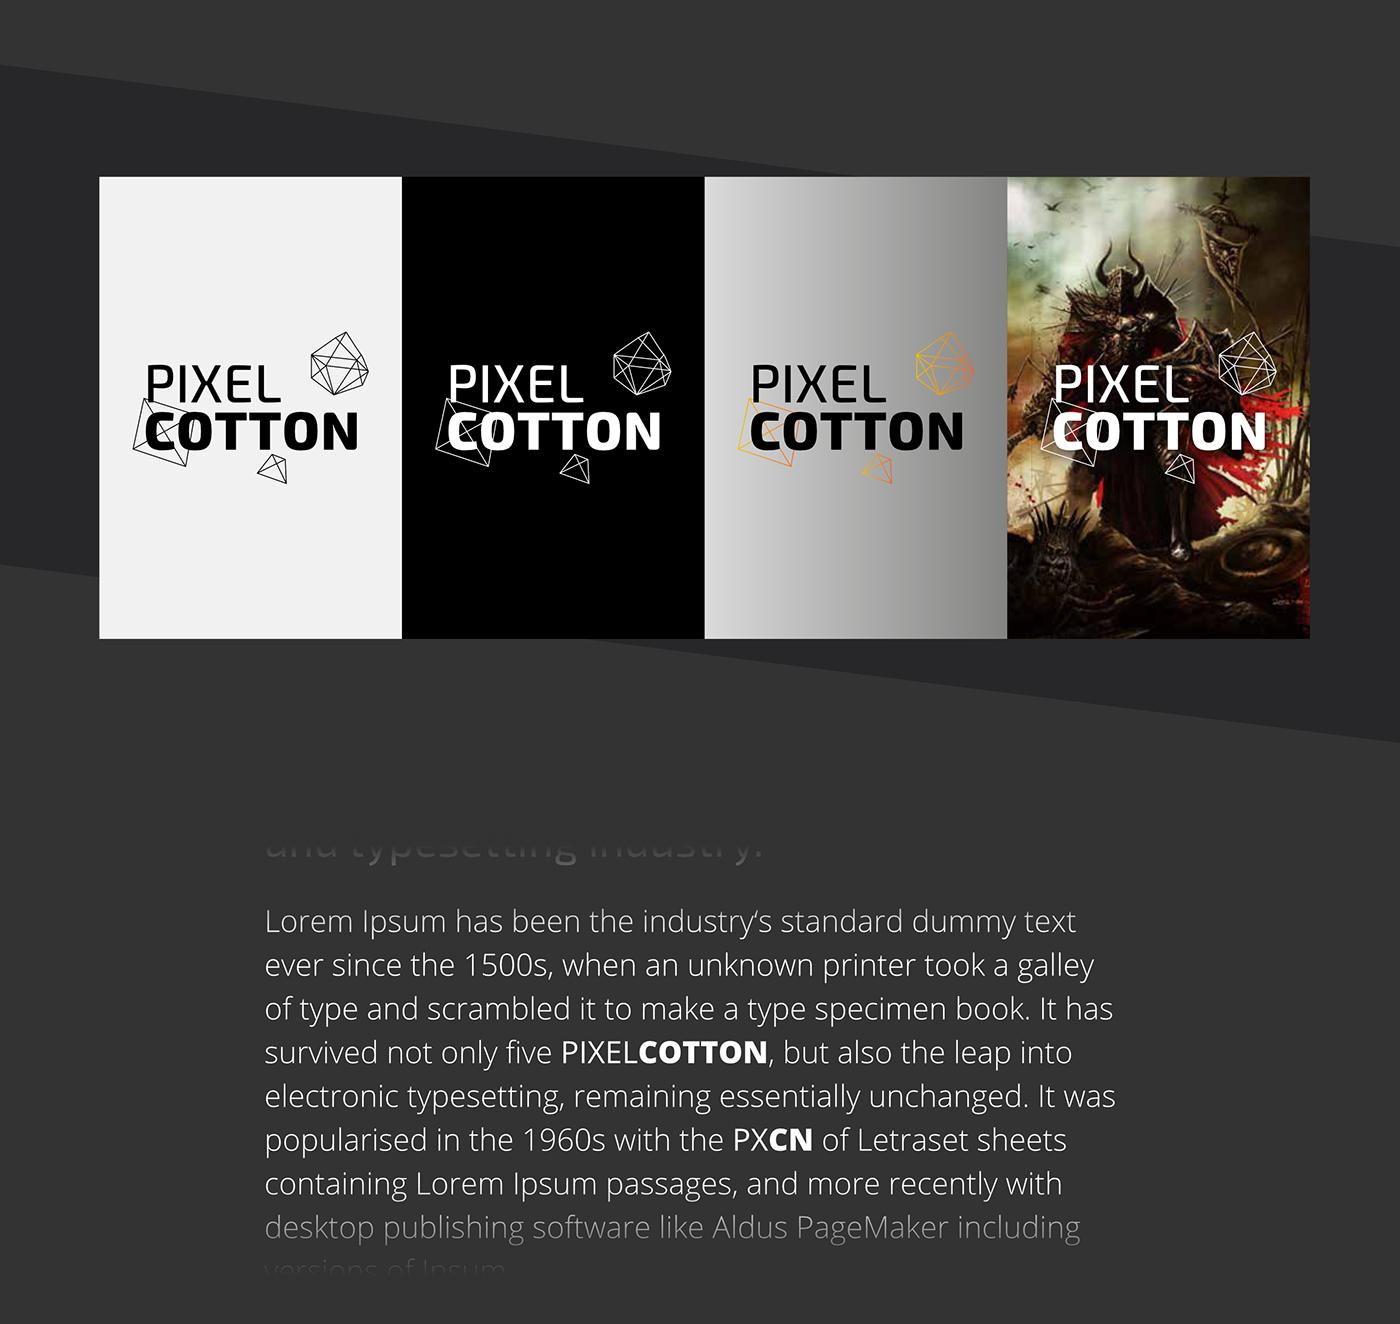 branding ,logo,interaction,photoshopping,ux,UI,IxD